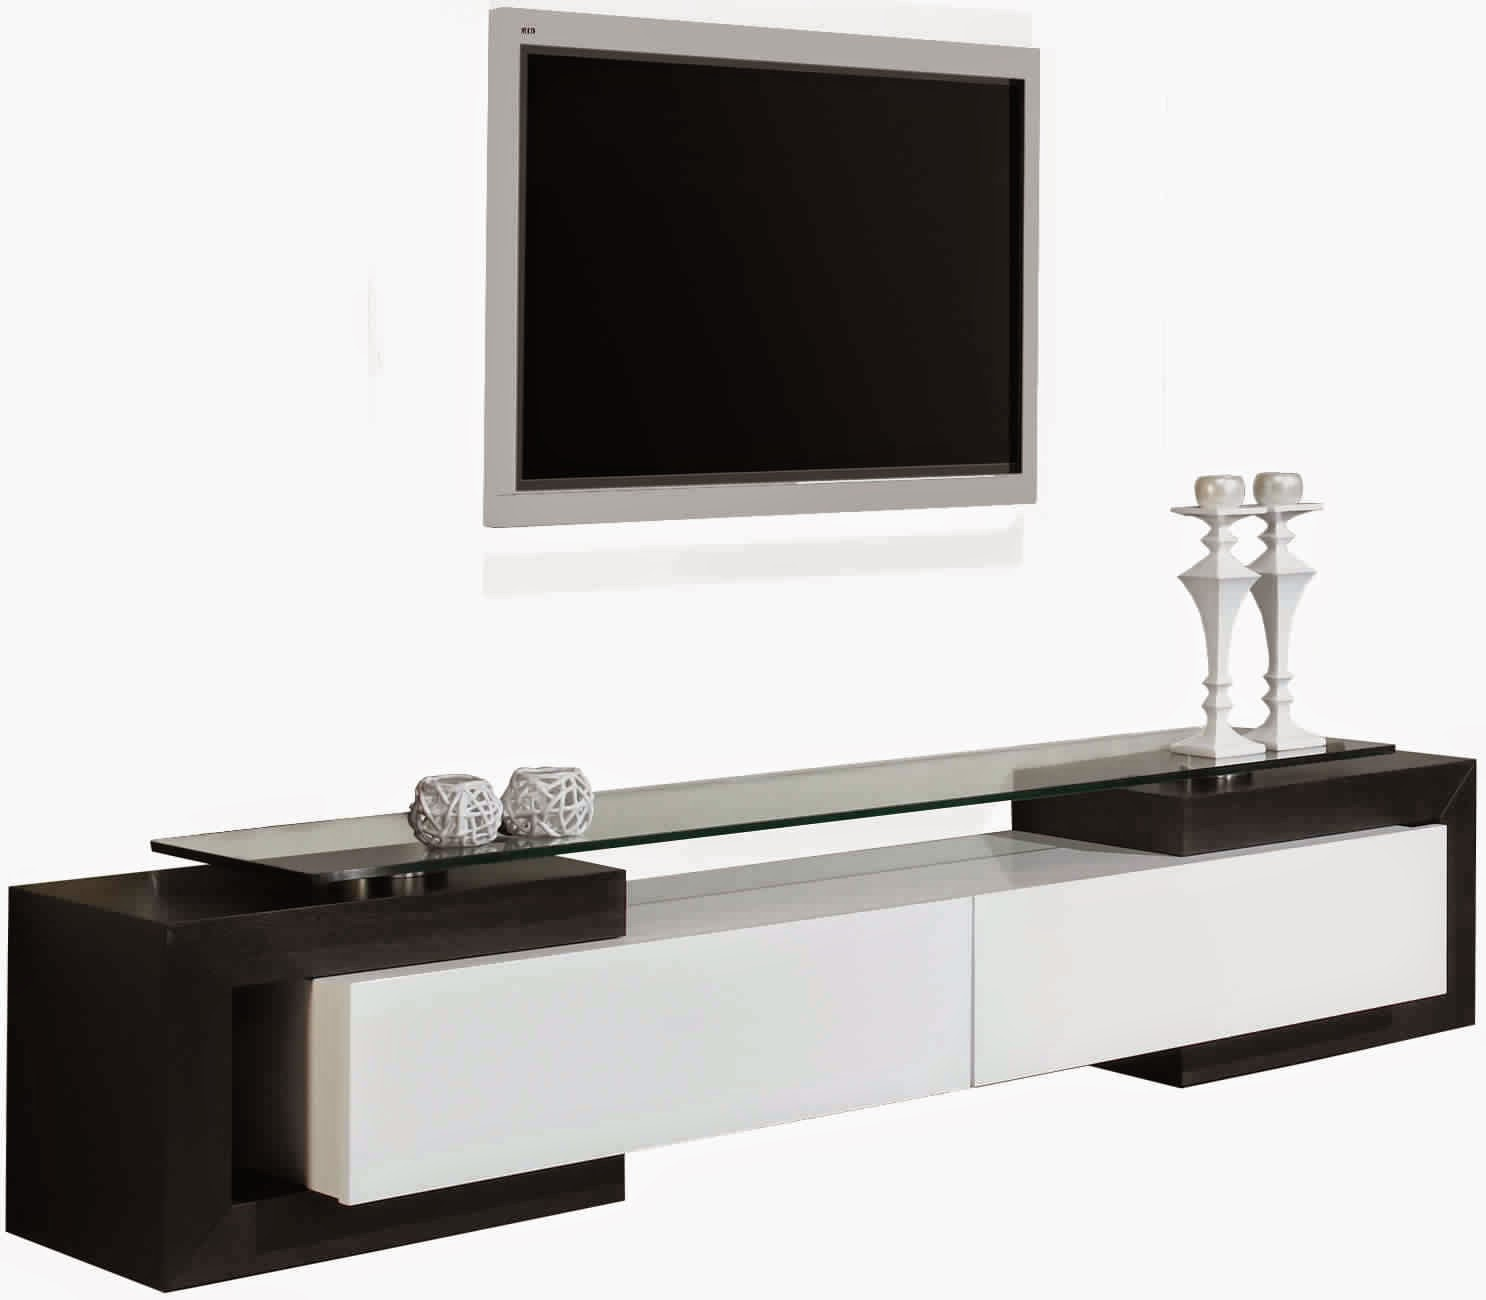 Meuble tv noir et blanc meuble tv for Meuble tele noir et blanc